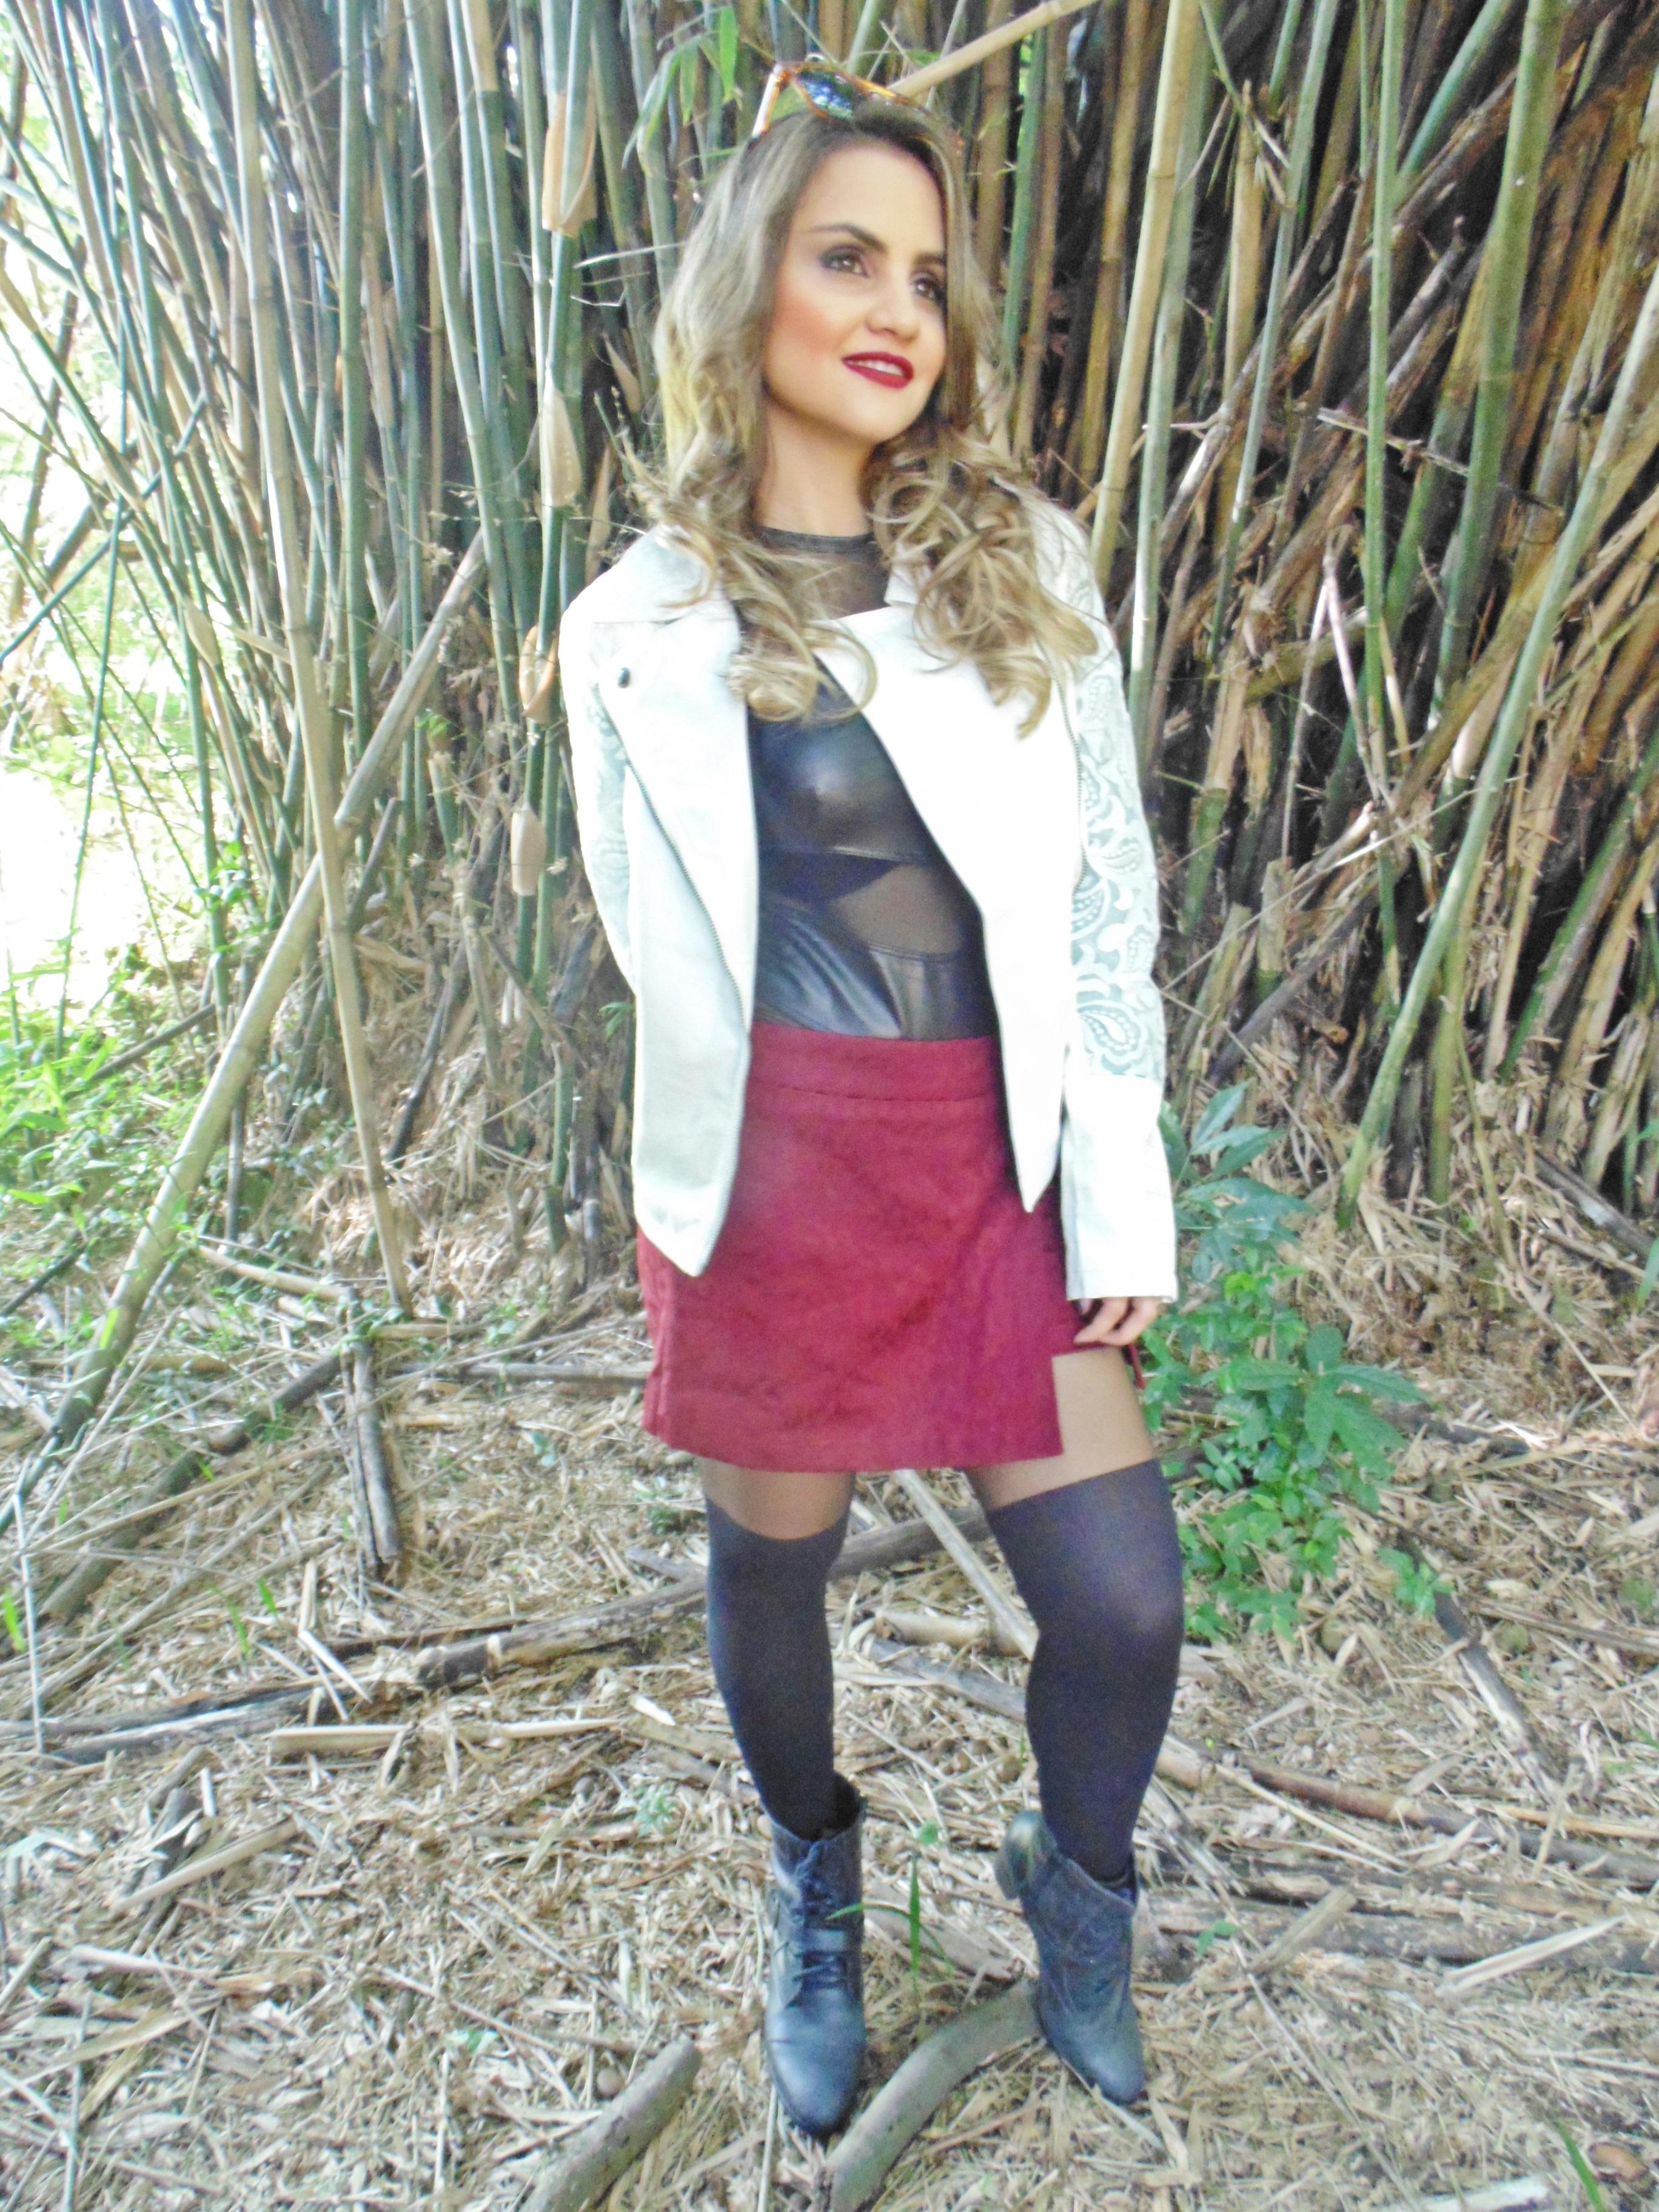 DSC02324 Look da Ka: Jaqueta branca + Short saia Marsala